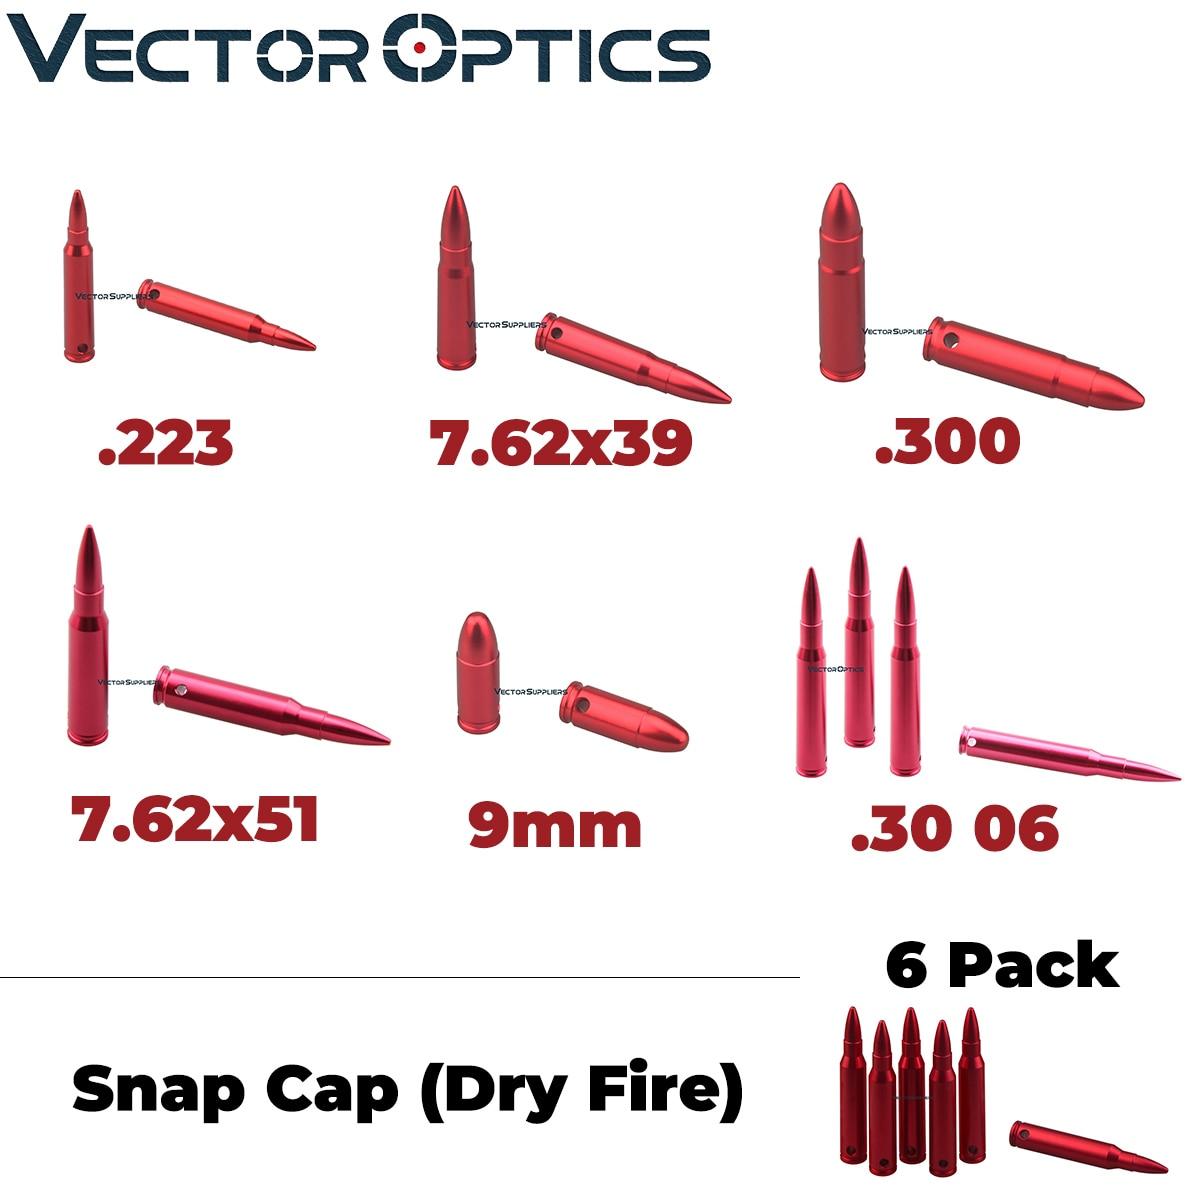 Vector Optics 6 Pack Snap Caps Dry Fire Rifle Pistol Calibers Safty Traning Round 7.62x39mm .223 Remington .300 .30 06  .308 9mm